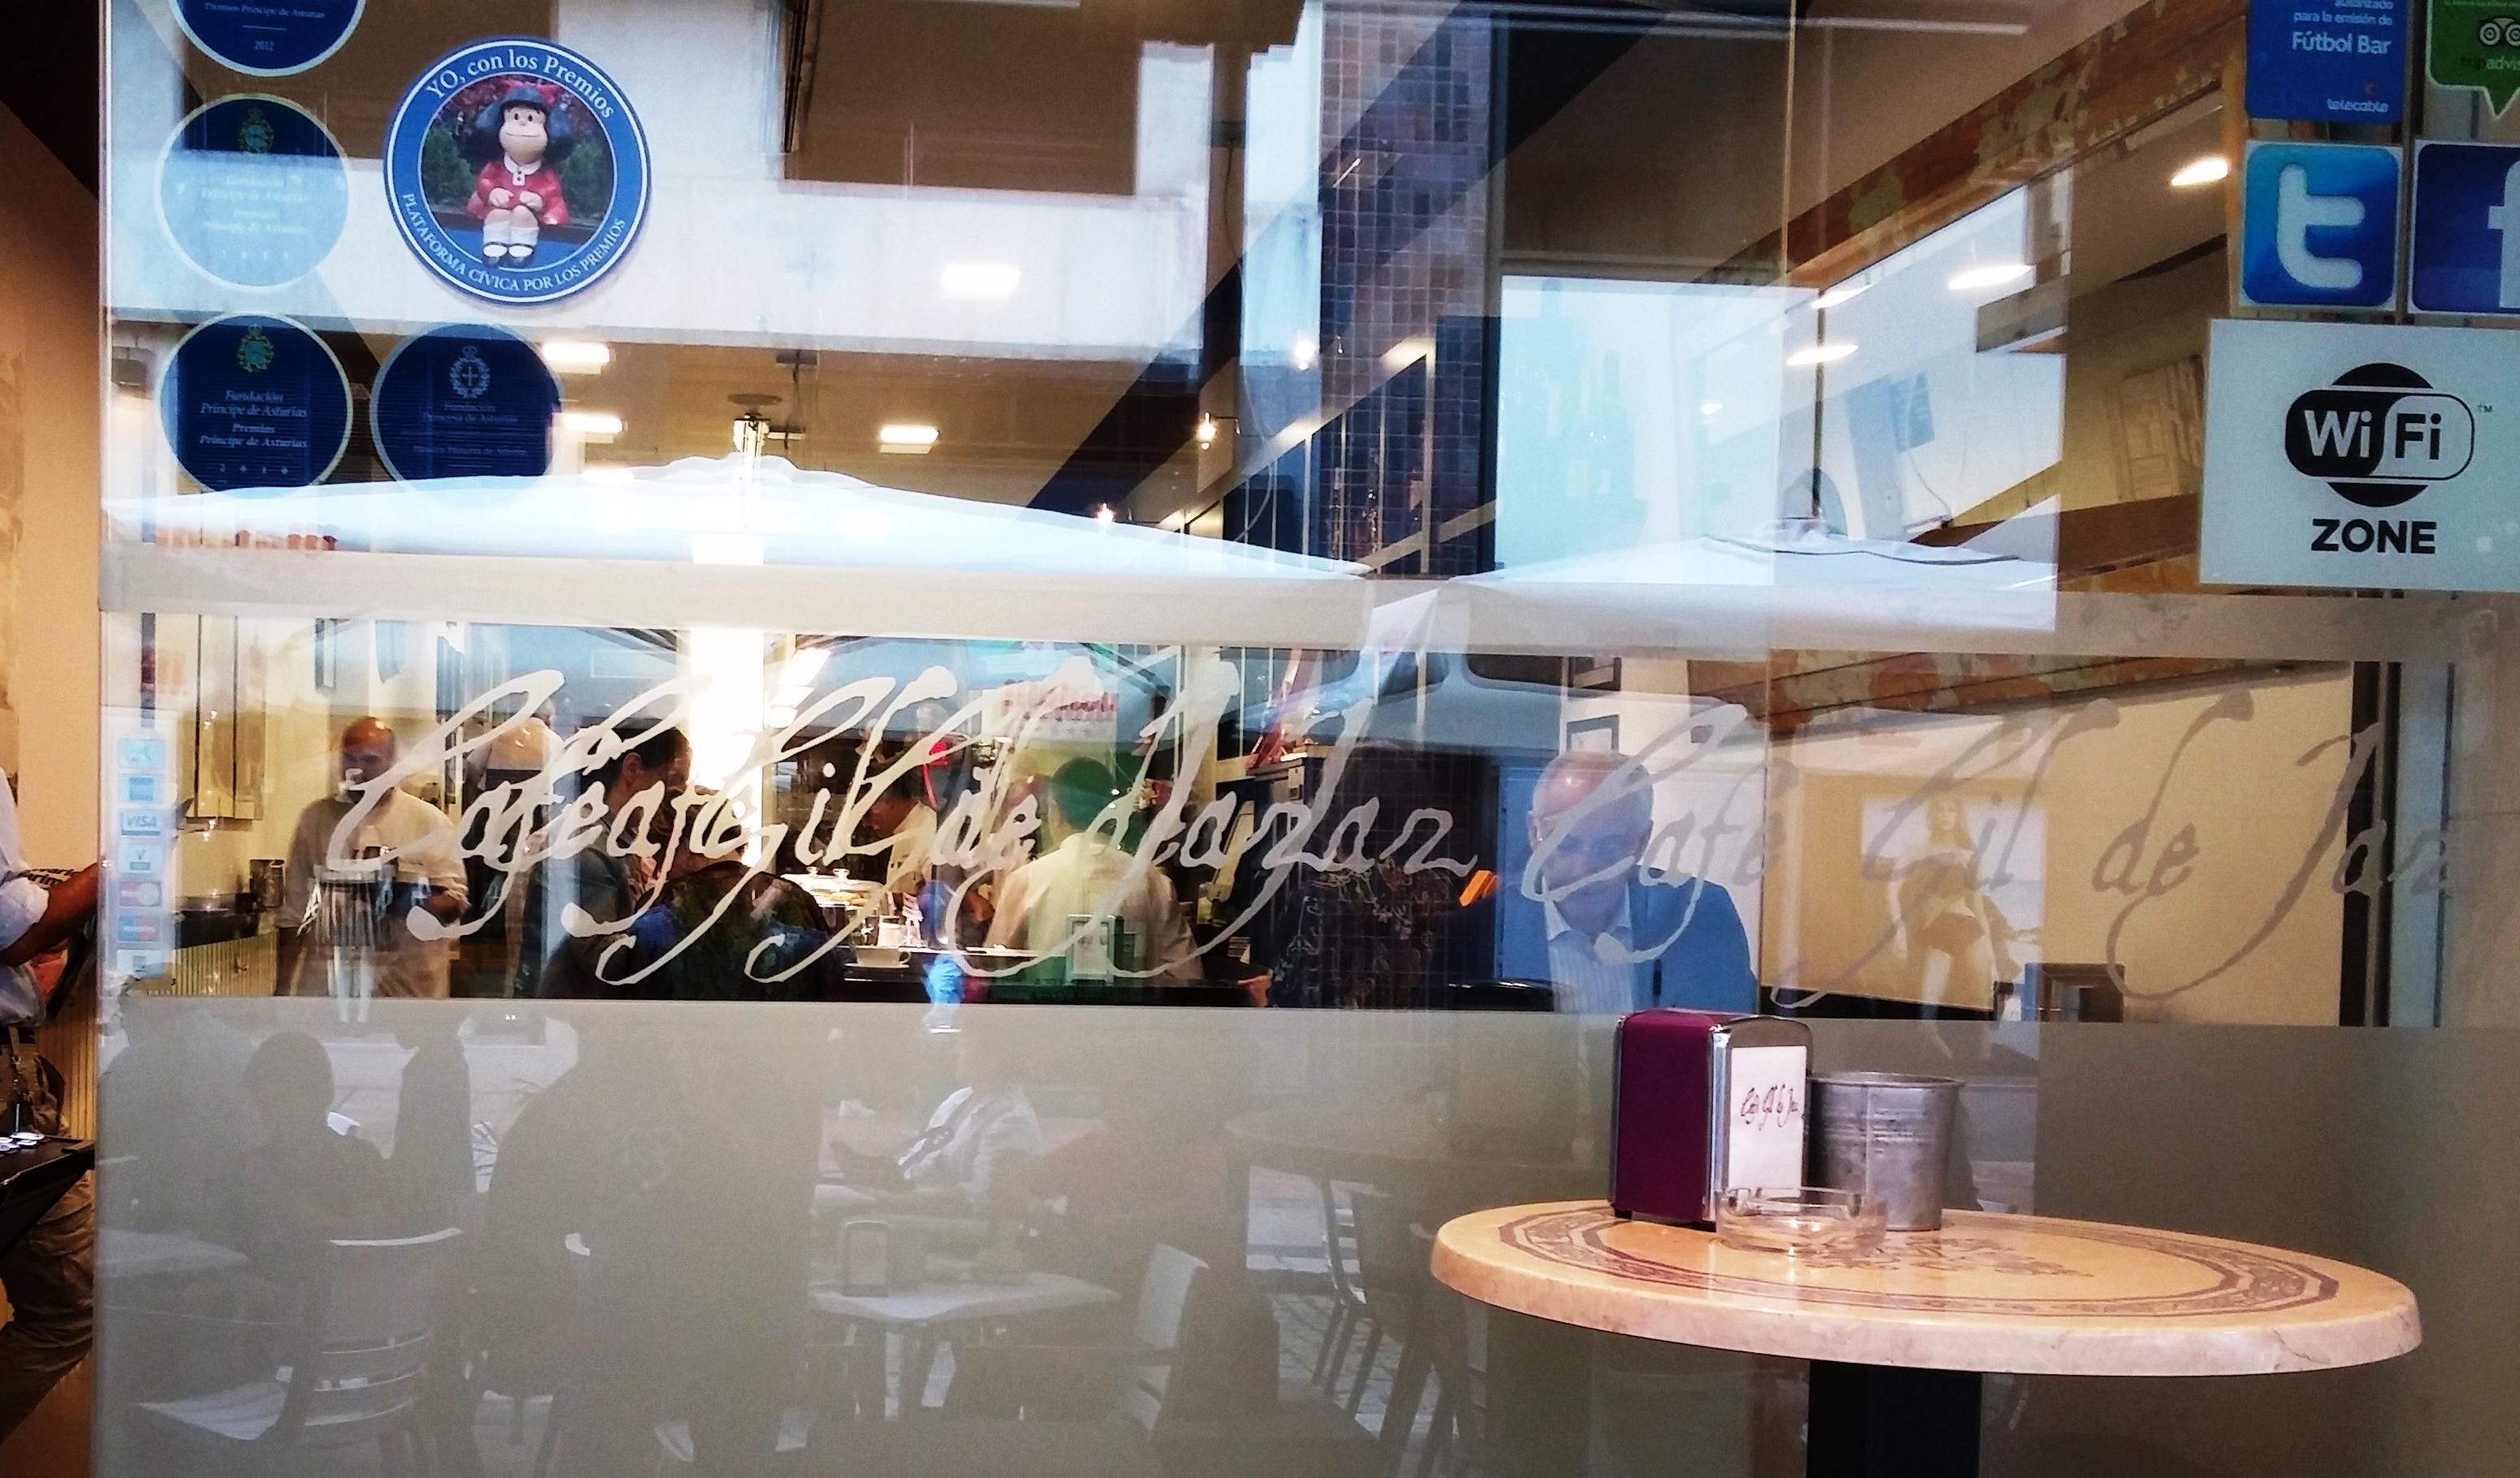 Café Gil de Jaz